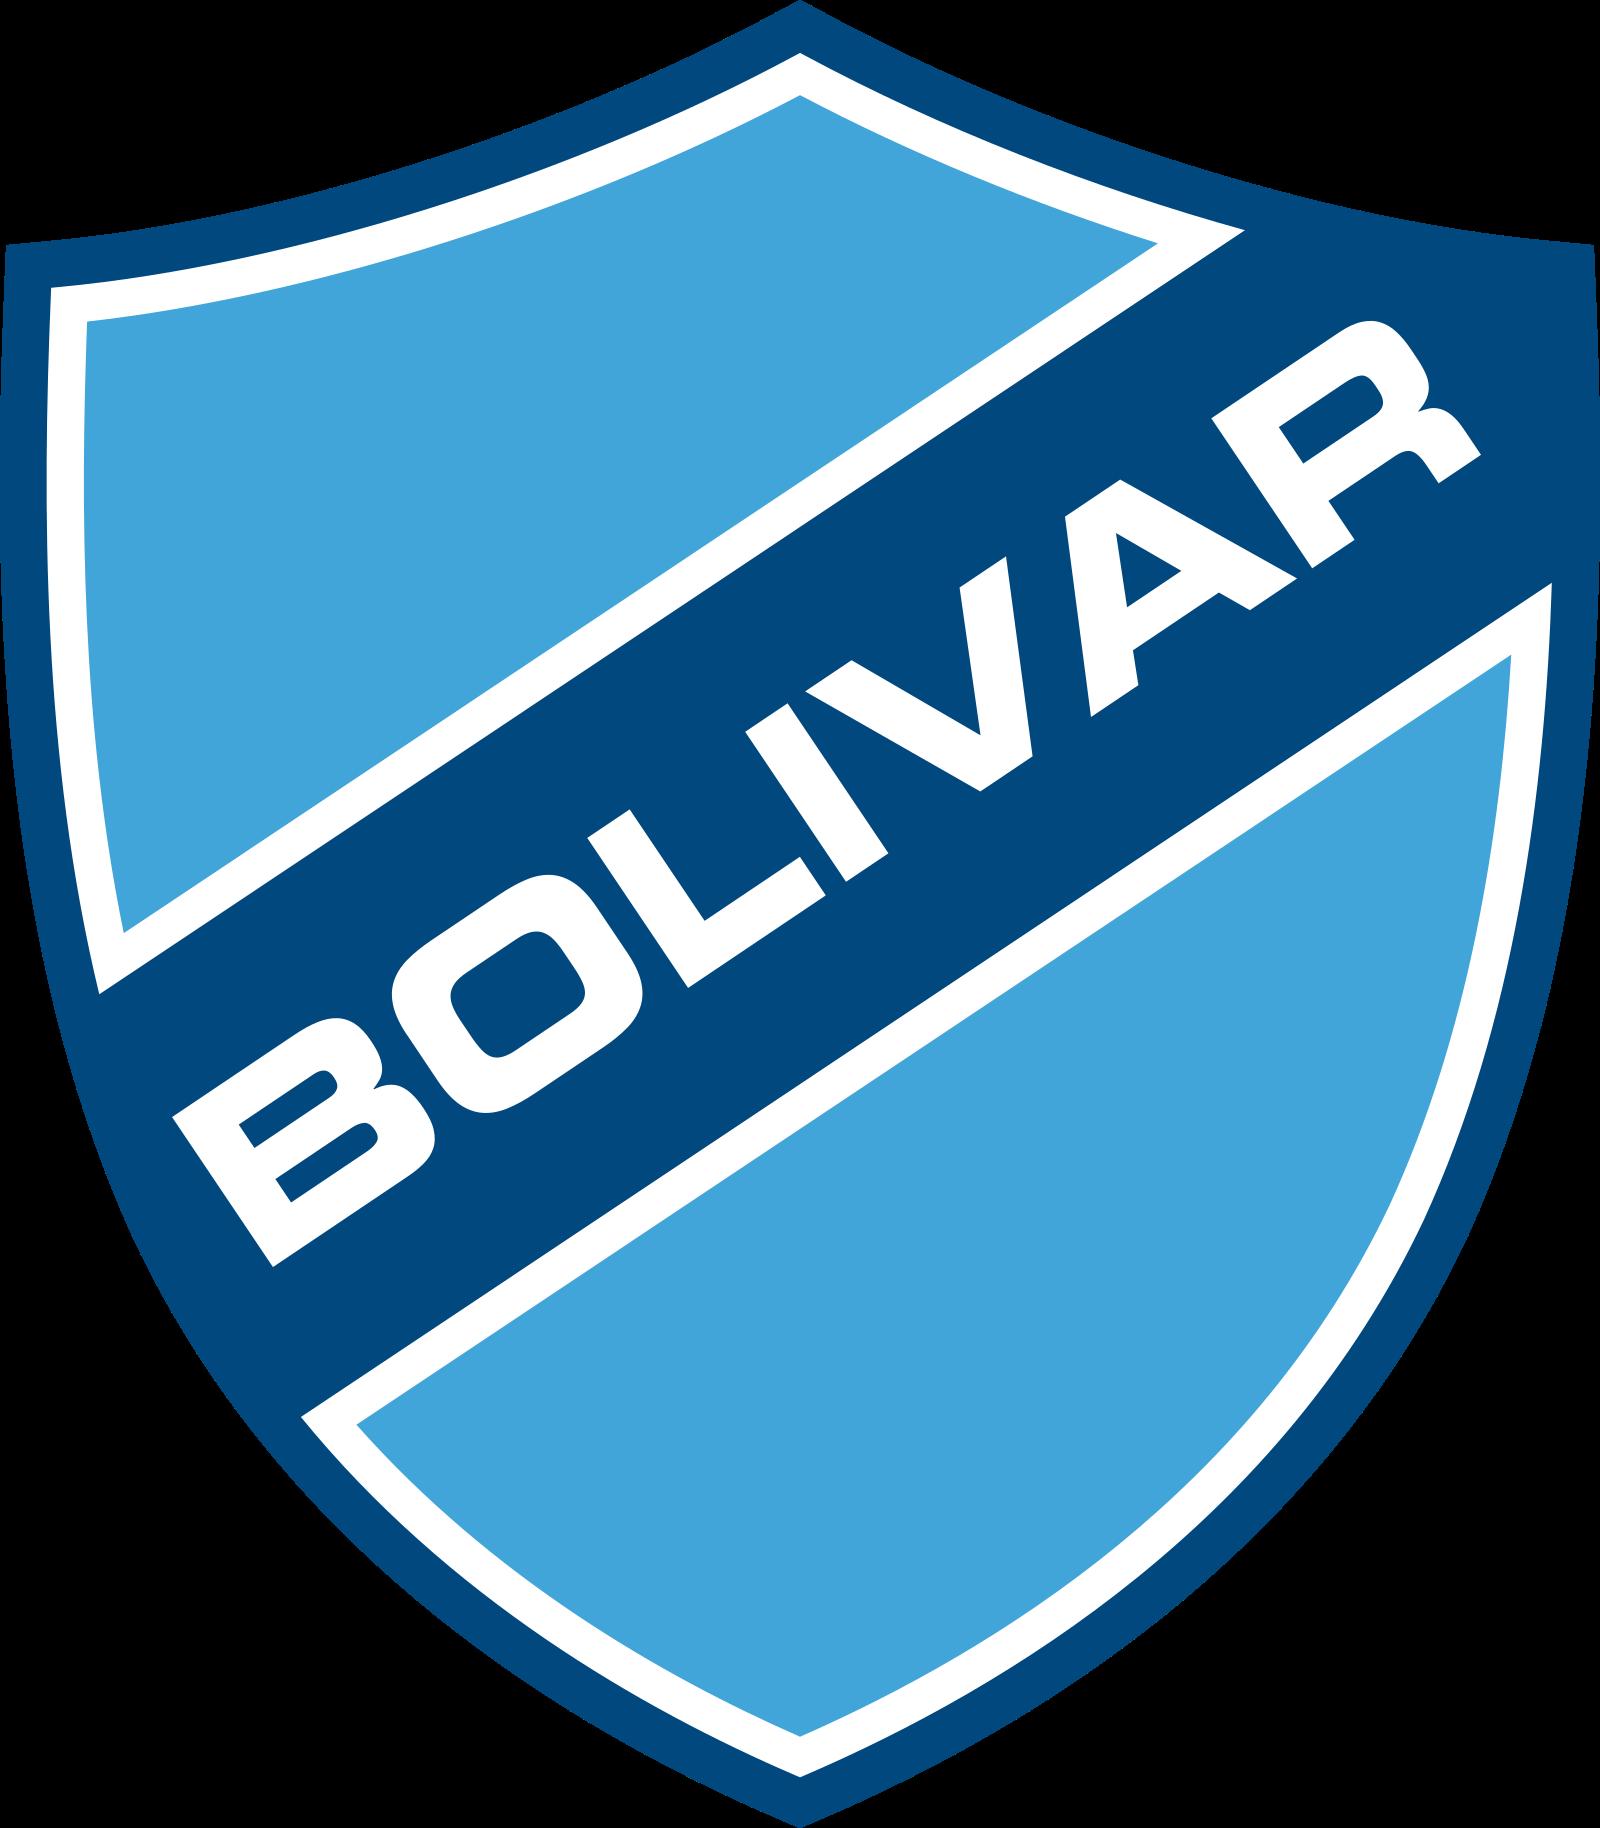 club bolívar logo 2 - Club Bolívar Logo - Escudo